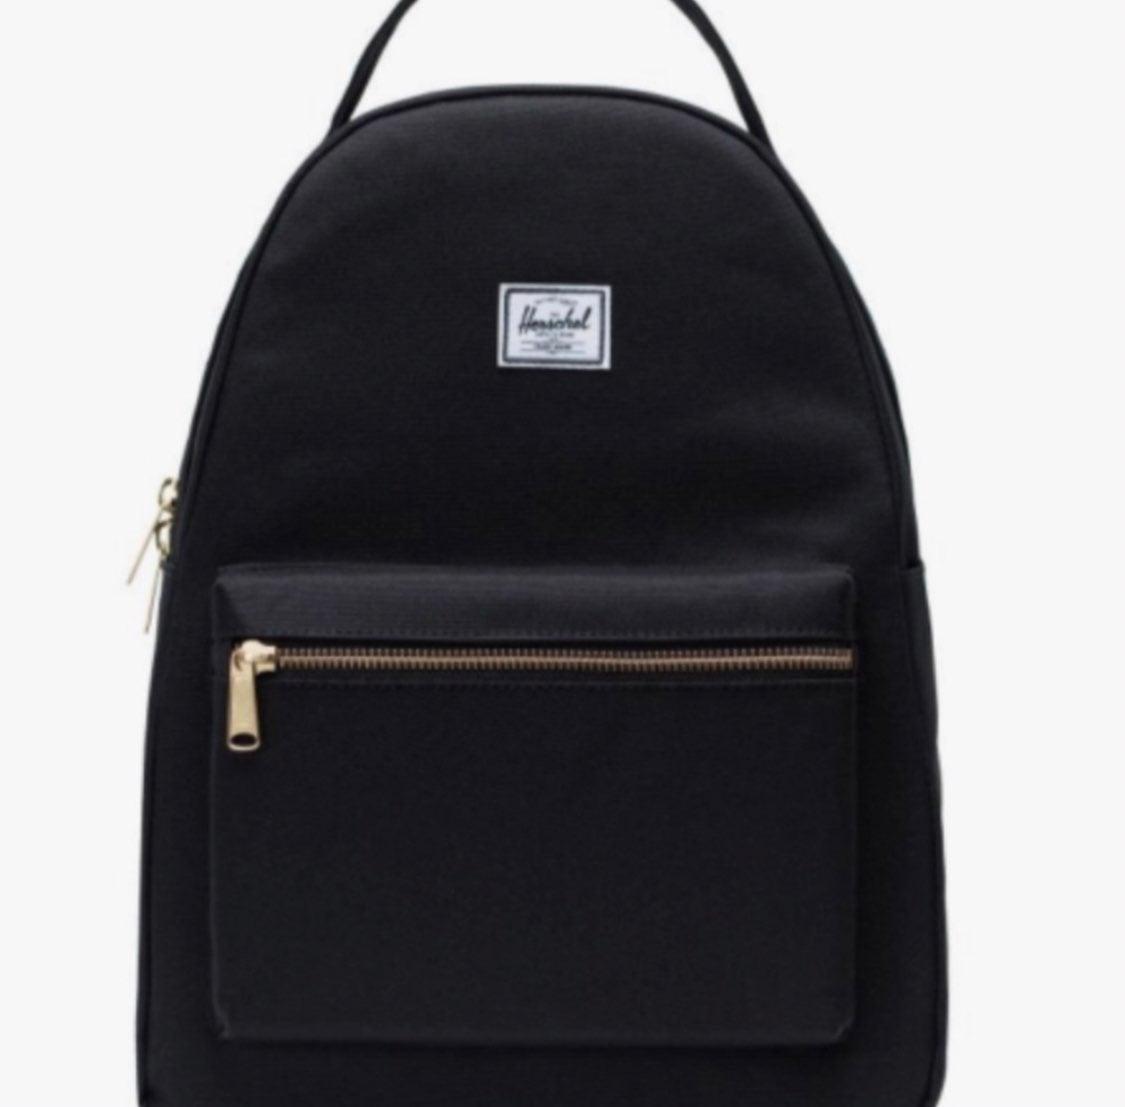 Hershel Nova Backpack